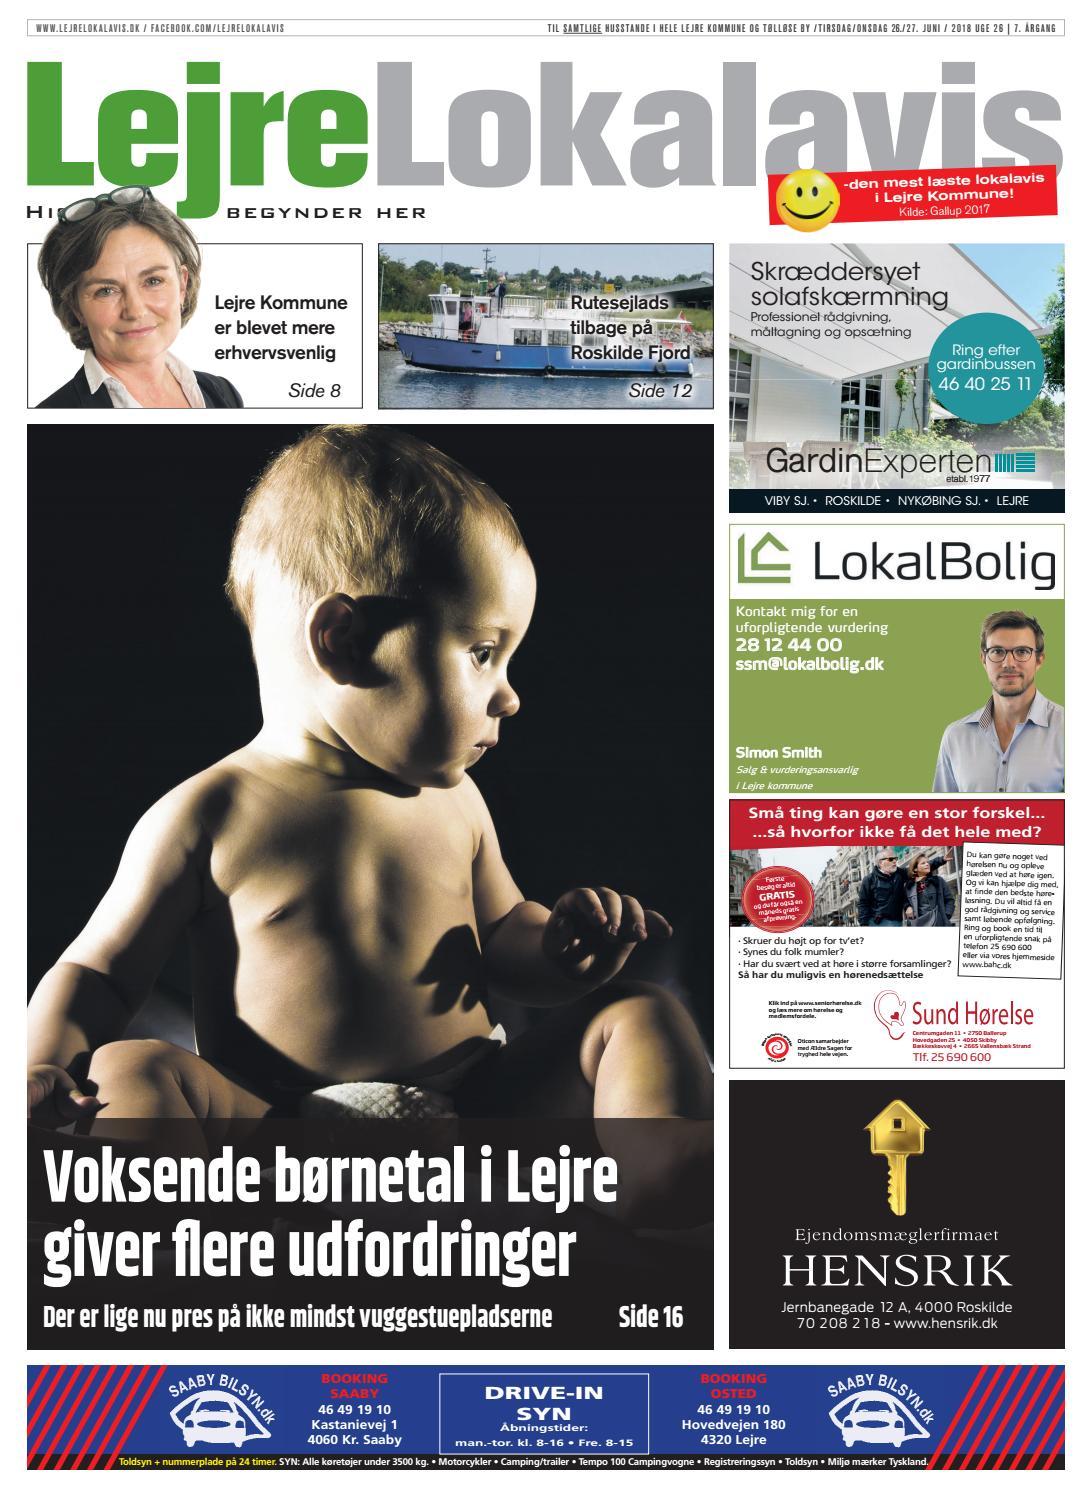 d069afe2c8b Lejre lokalavis uge 26 2018 by Lejre Lokalavis - issuu